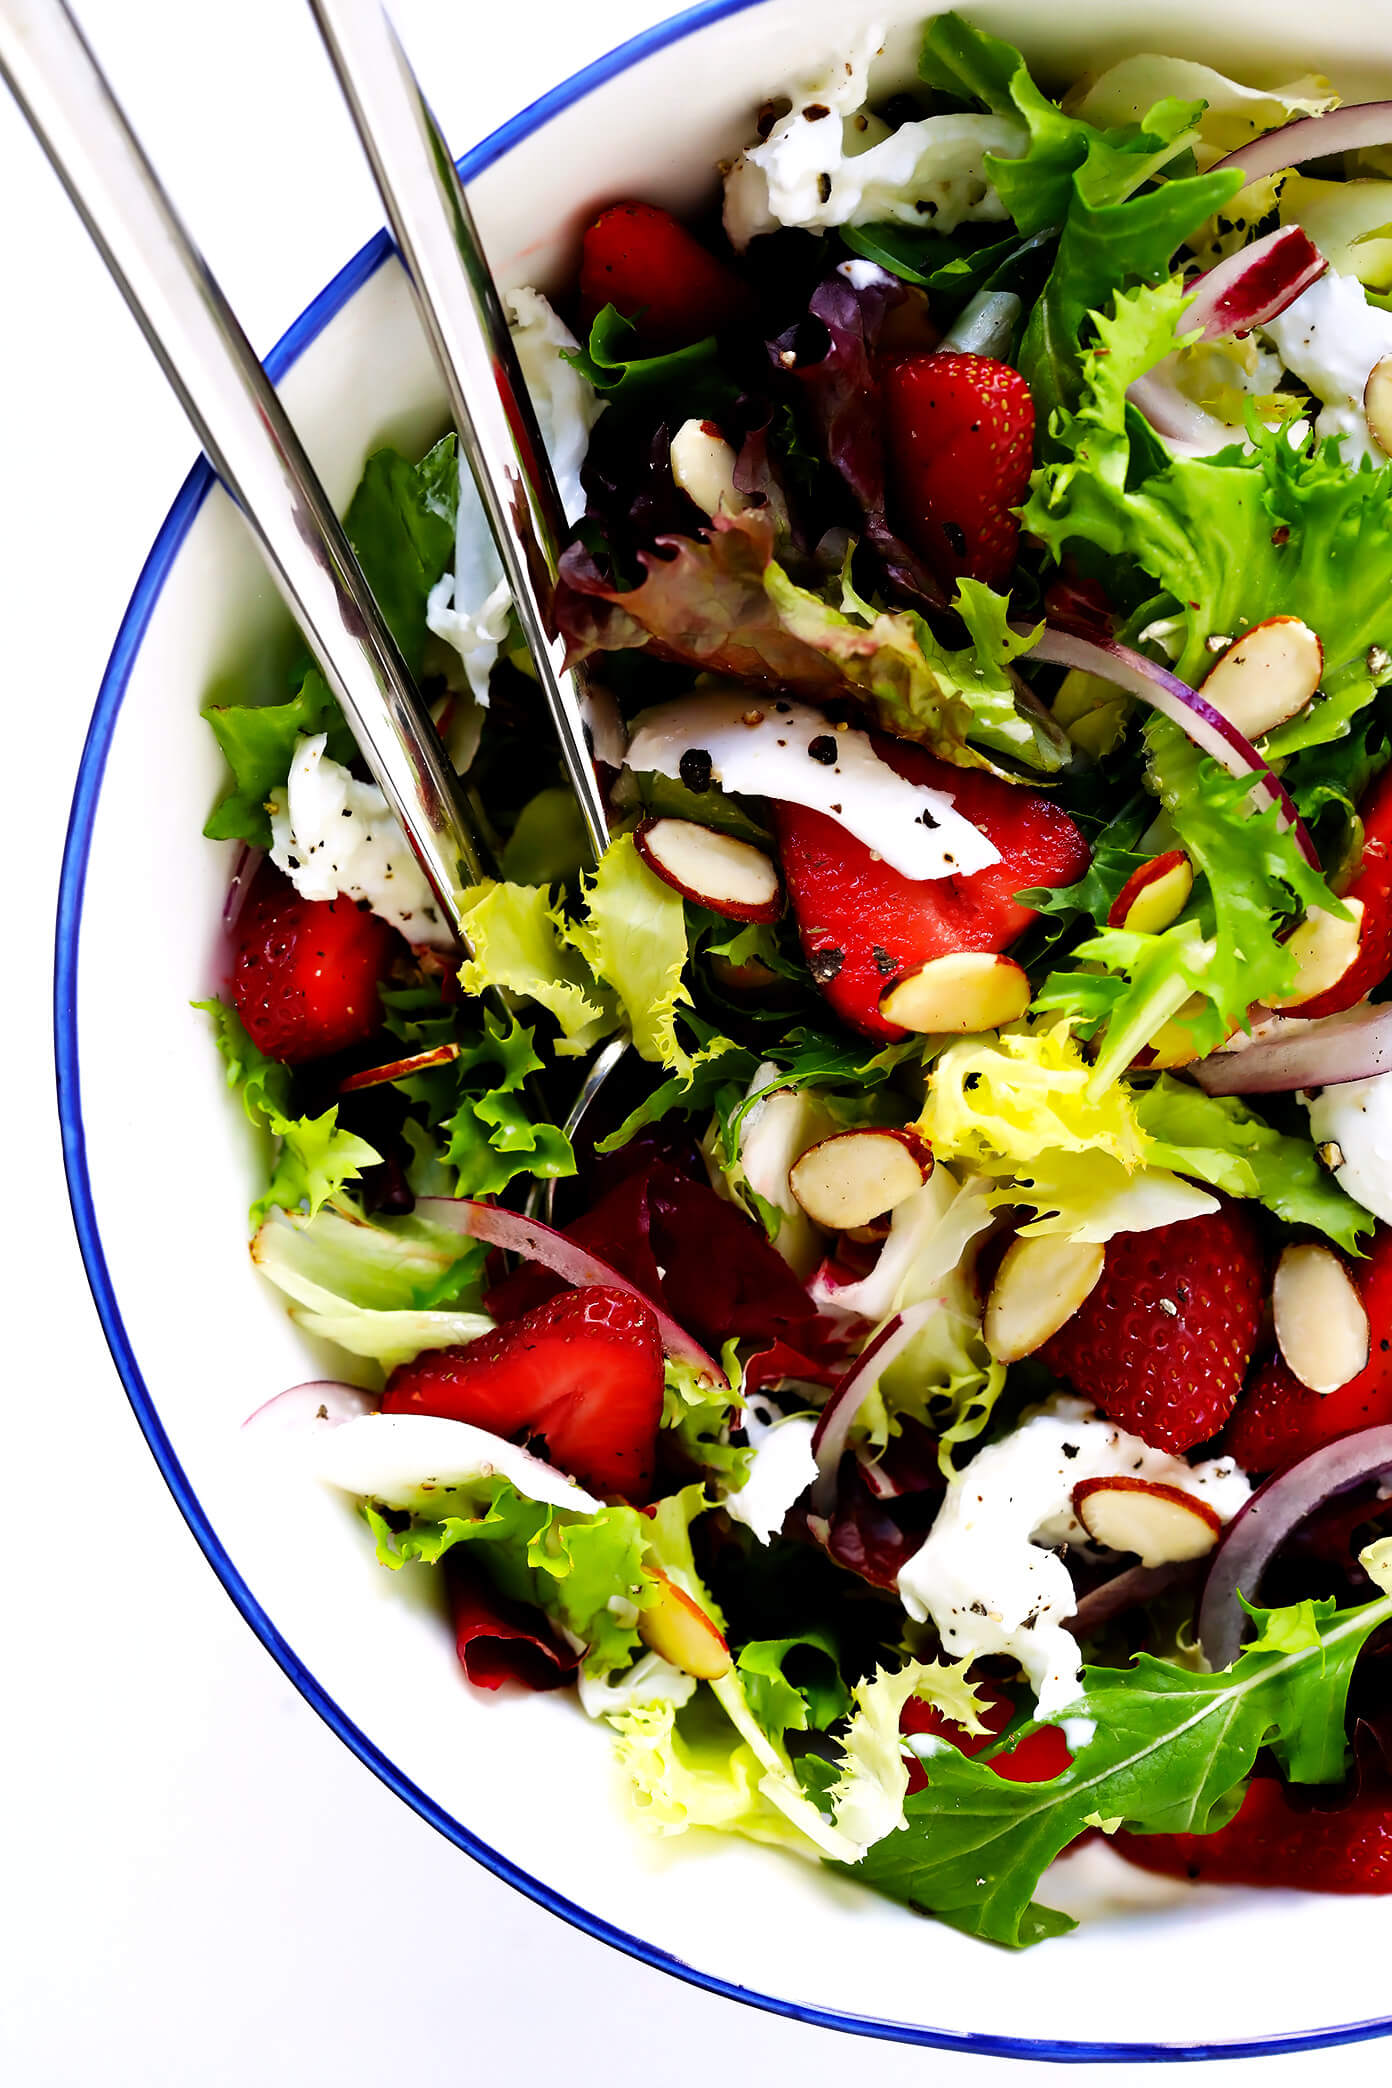 How To Make Strawberry Burrata Salad with Basil Vinaigrette